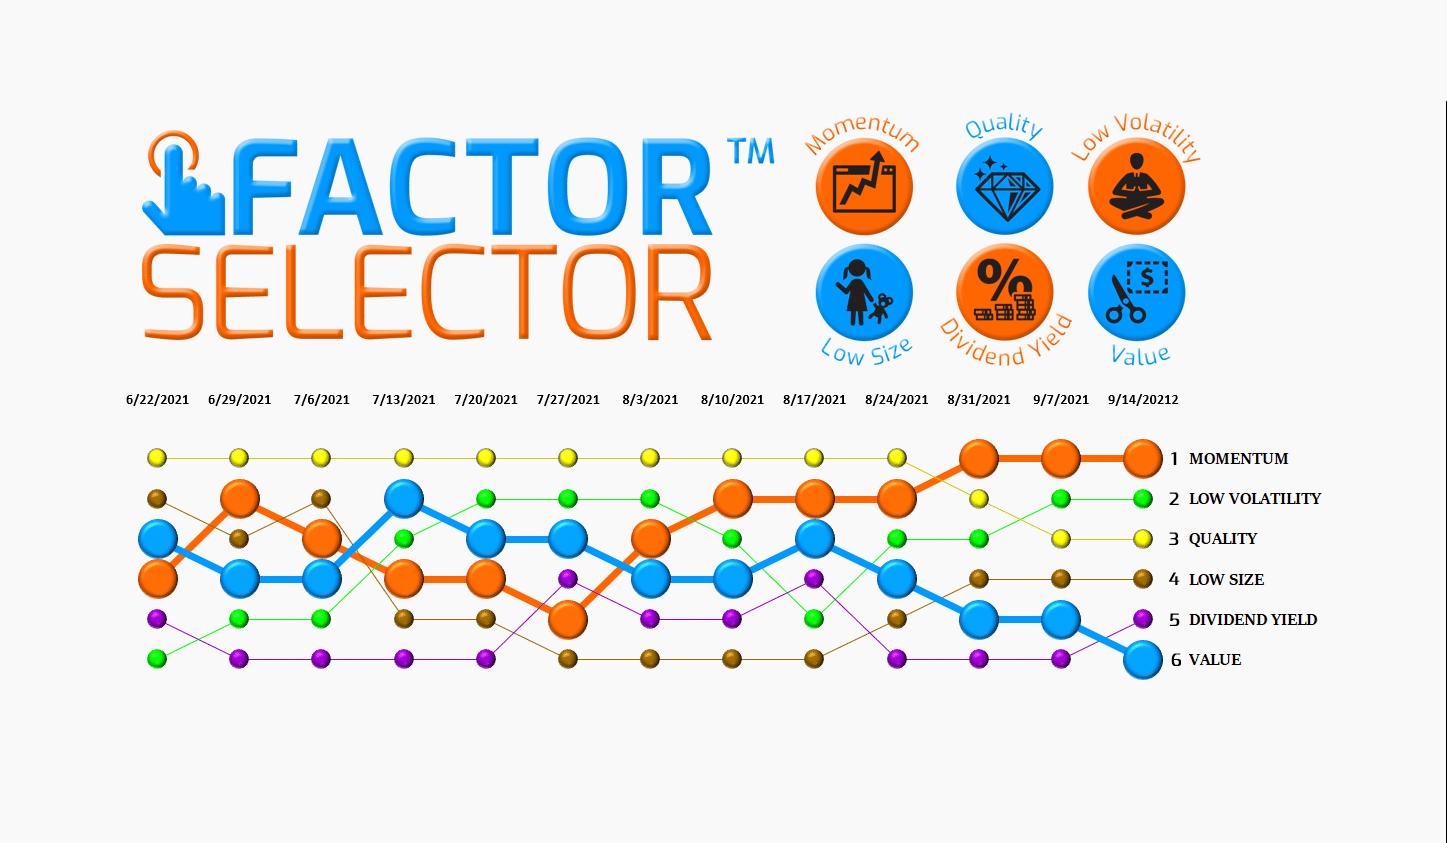 Factor Selector™  – 09/15/21 via @https://www.pinterest.com/market_scholars